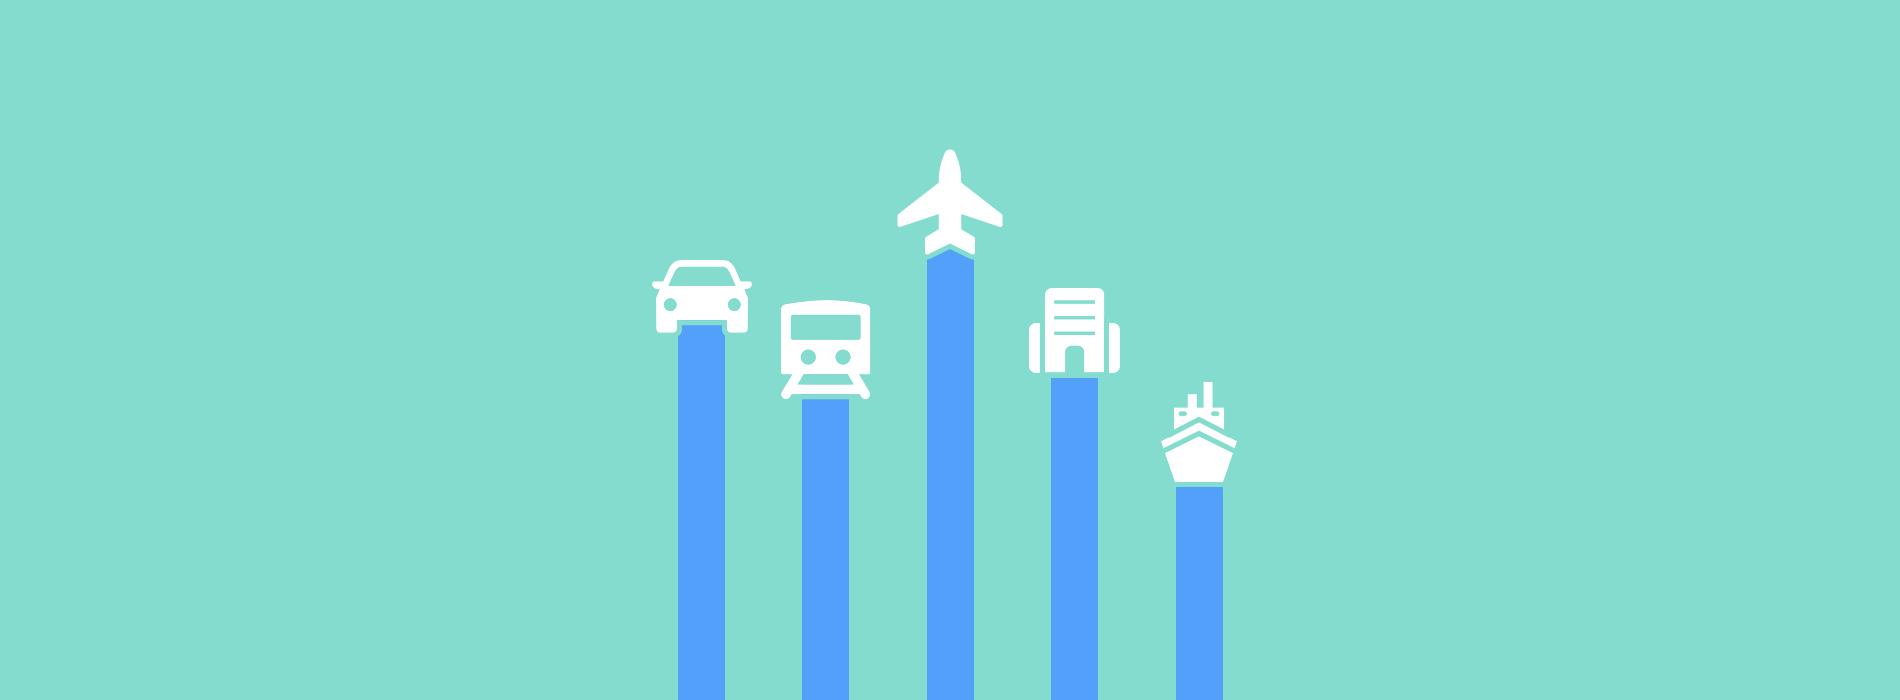 Online Travel Trends: 12 Fascinating Stats